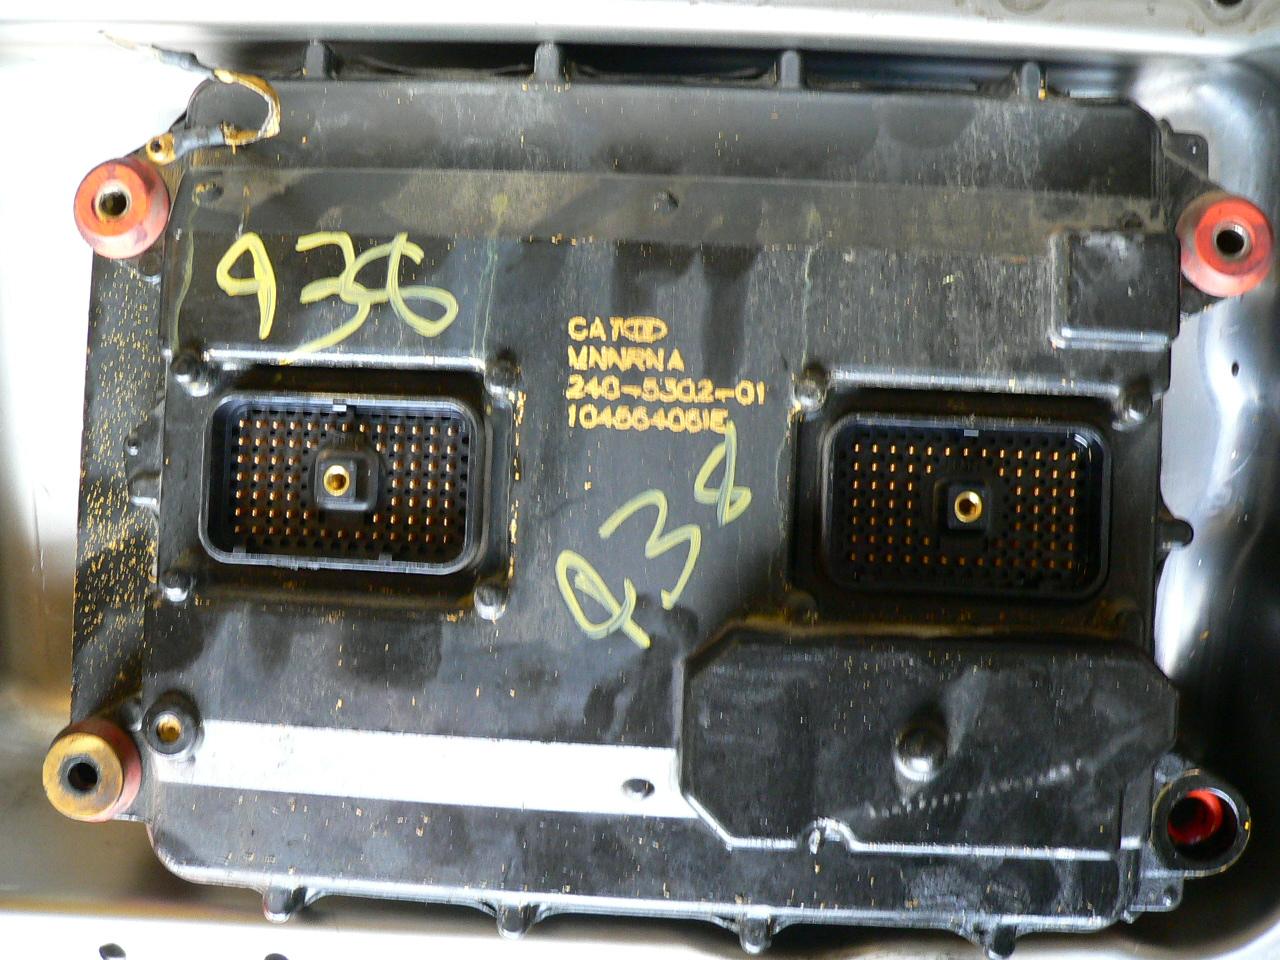 Freightliner Used Parts 2008 Ecm Wiring Diagram Coolant 2006 M2 102 Truck For Sale Unit 938